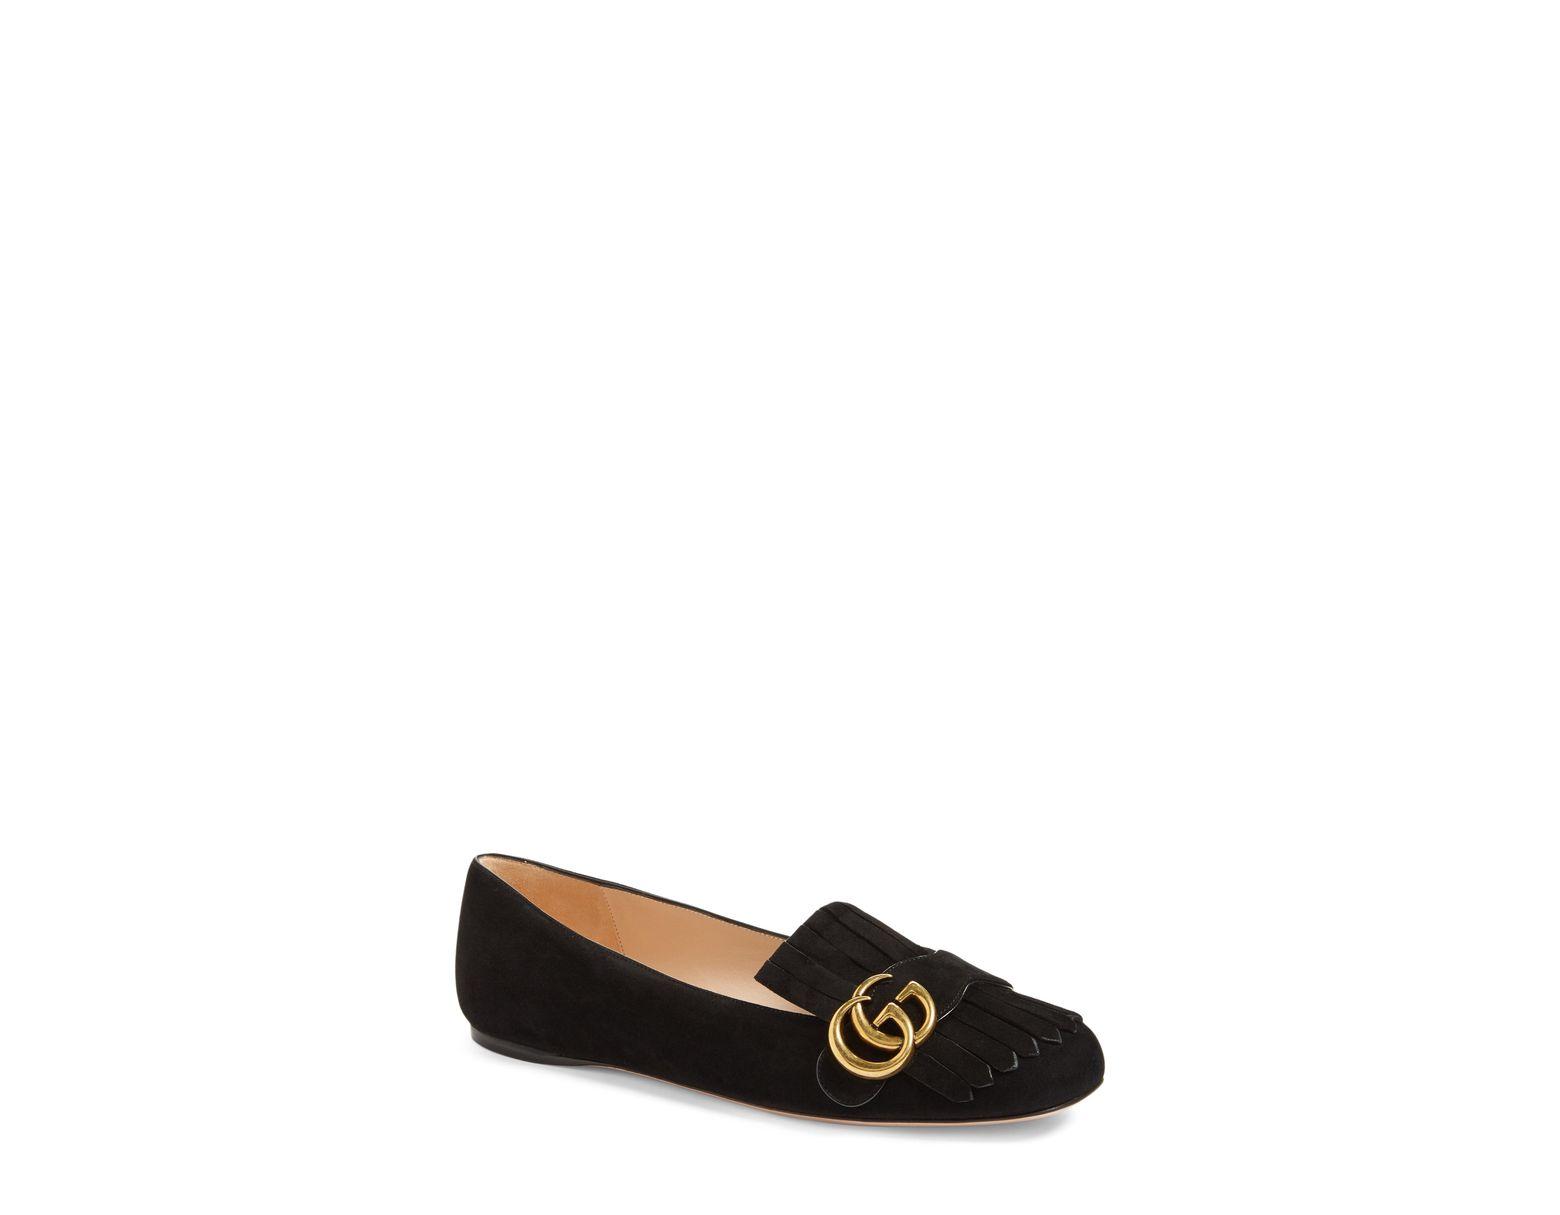 78b1f17fe4a Lyst - Gucci Marmont Fringe Flat in Black